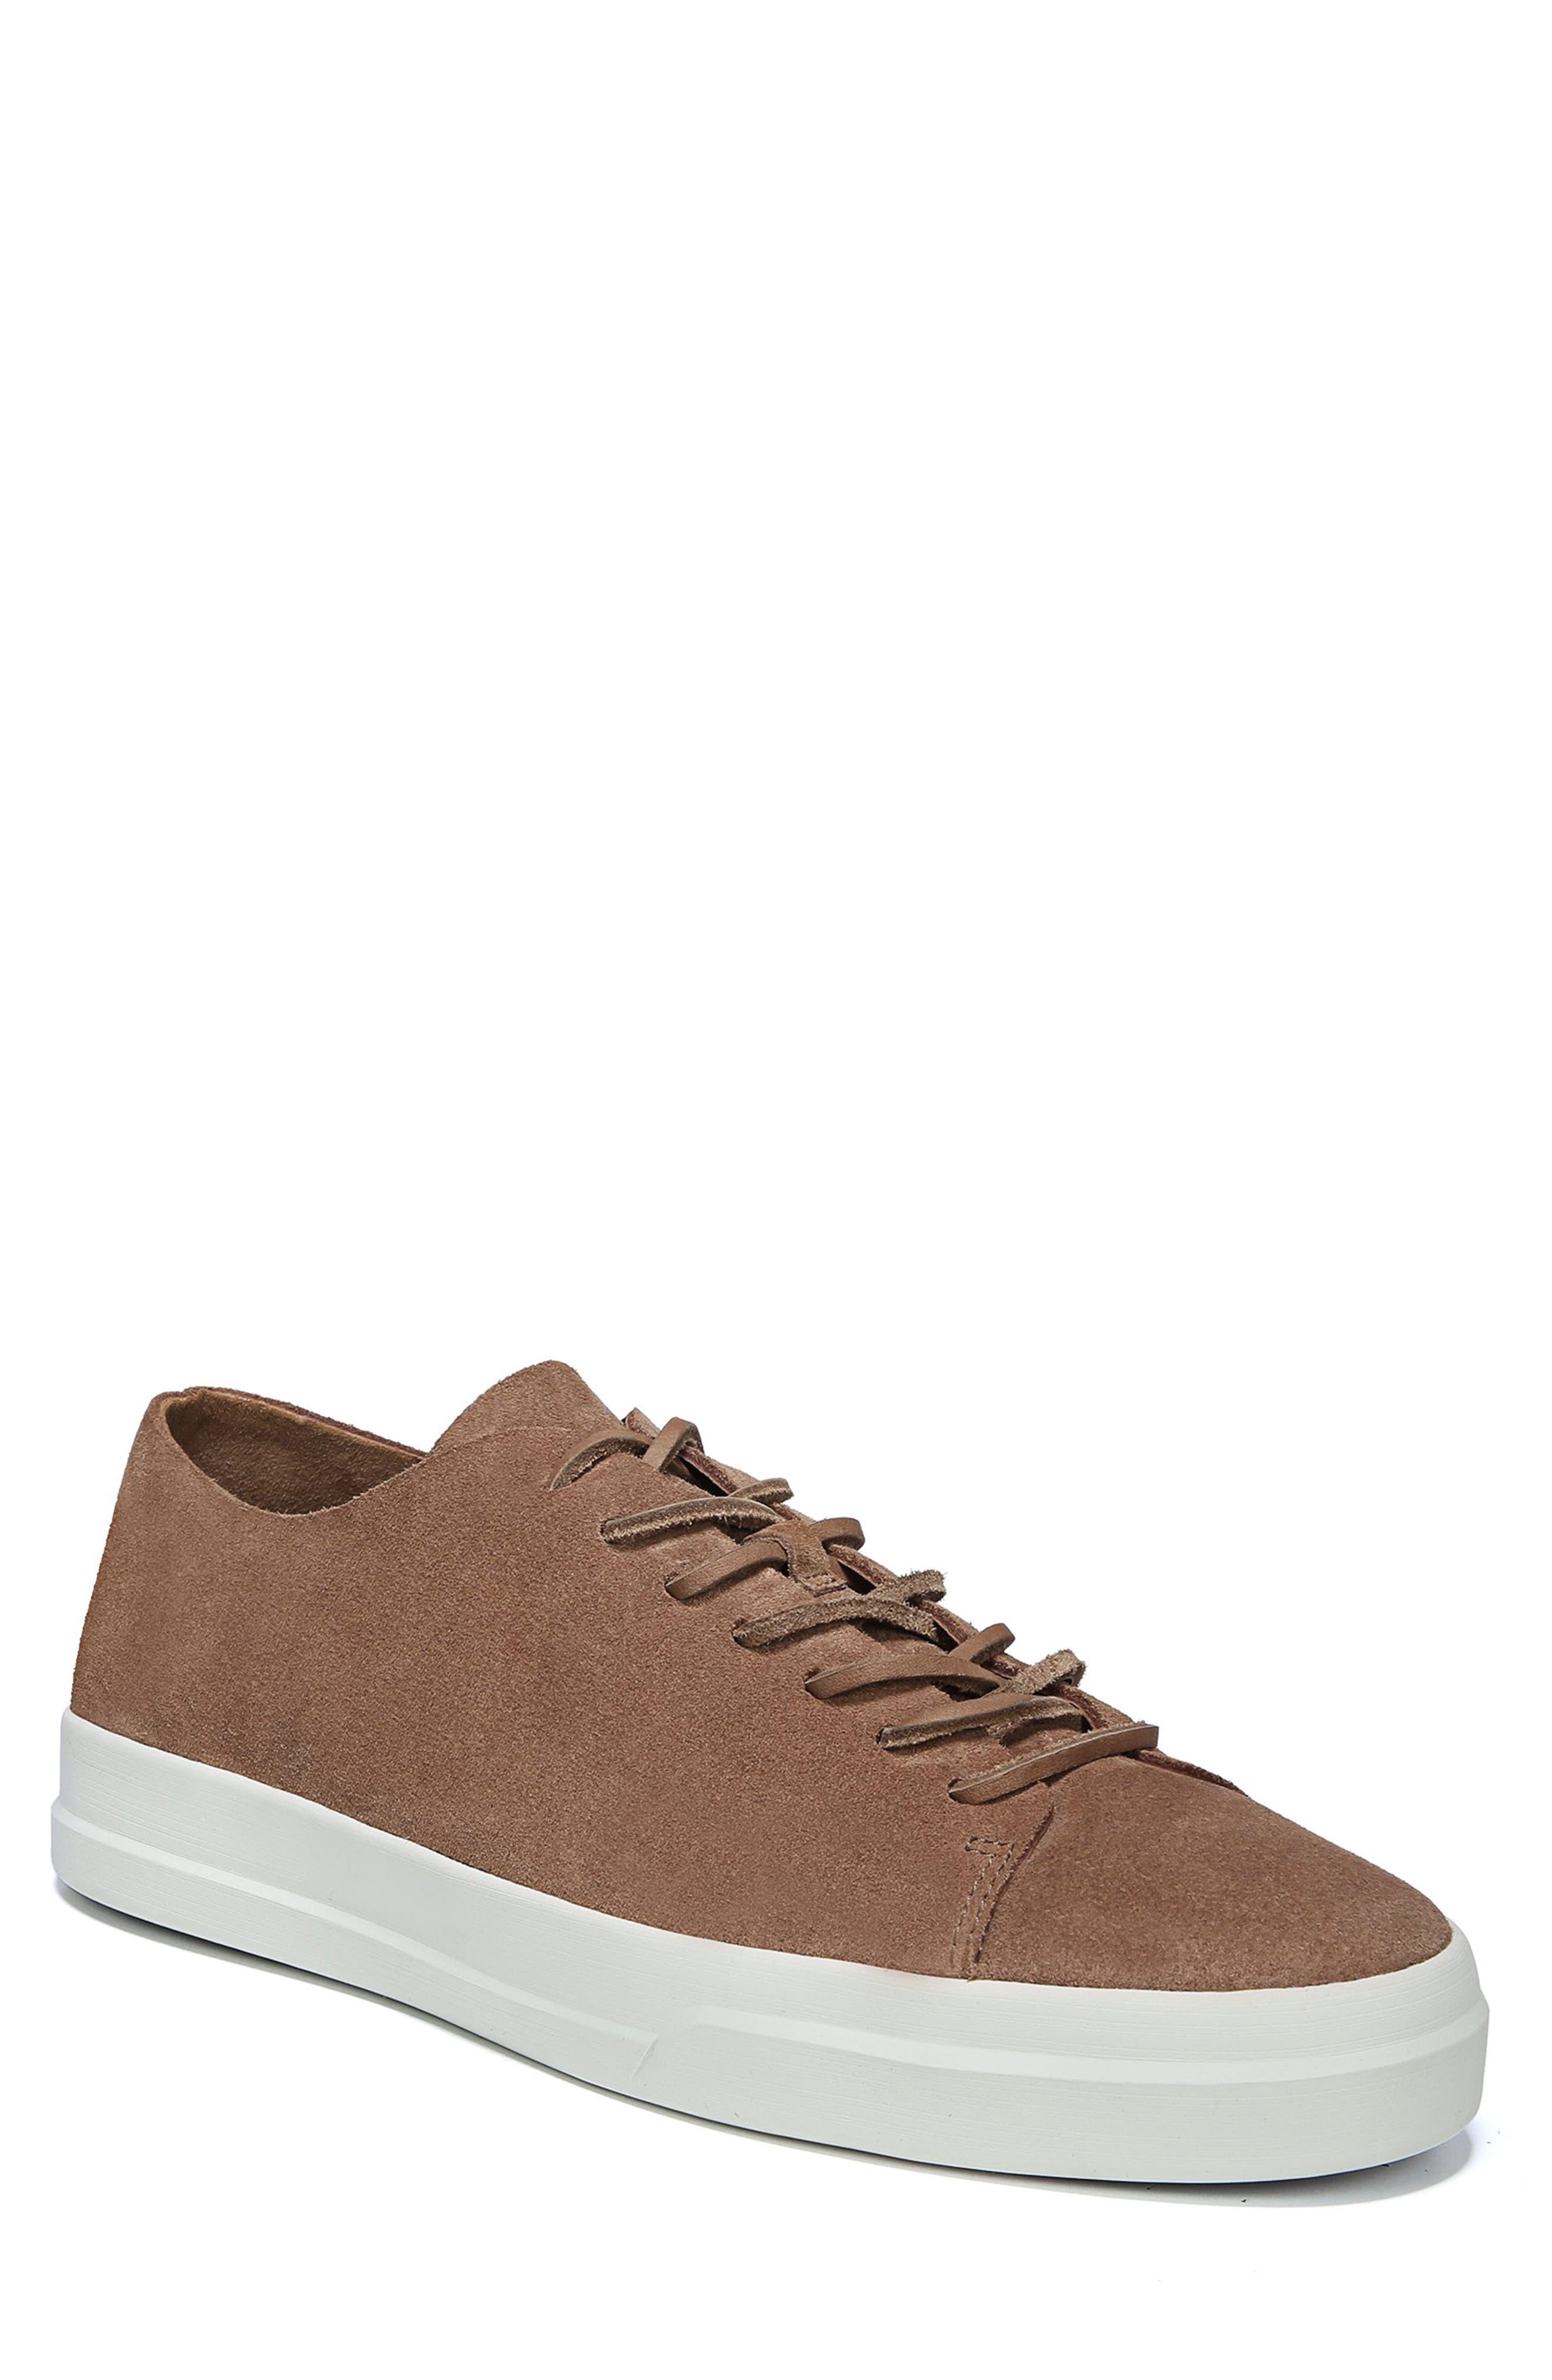 Copeland Sneaker,                         Main,                         color, CEDAR